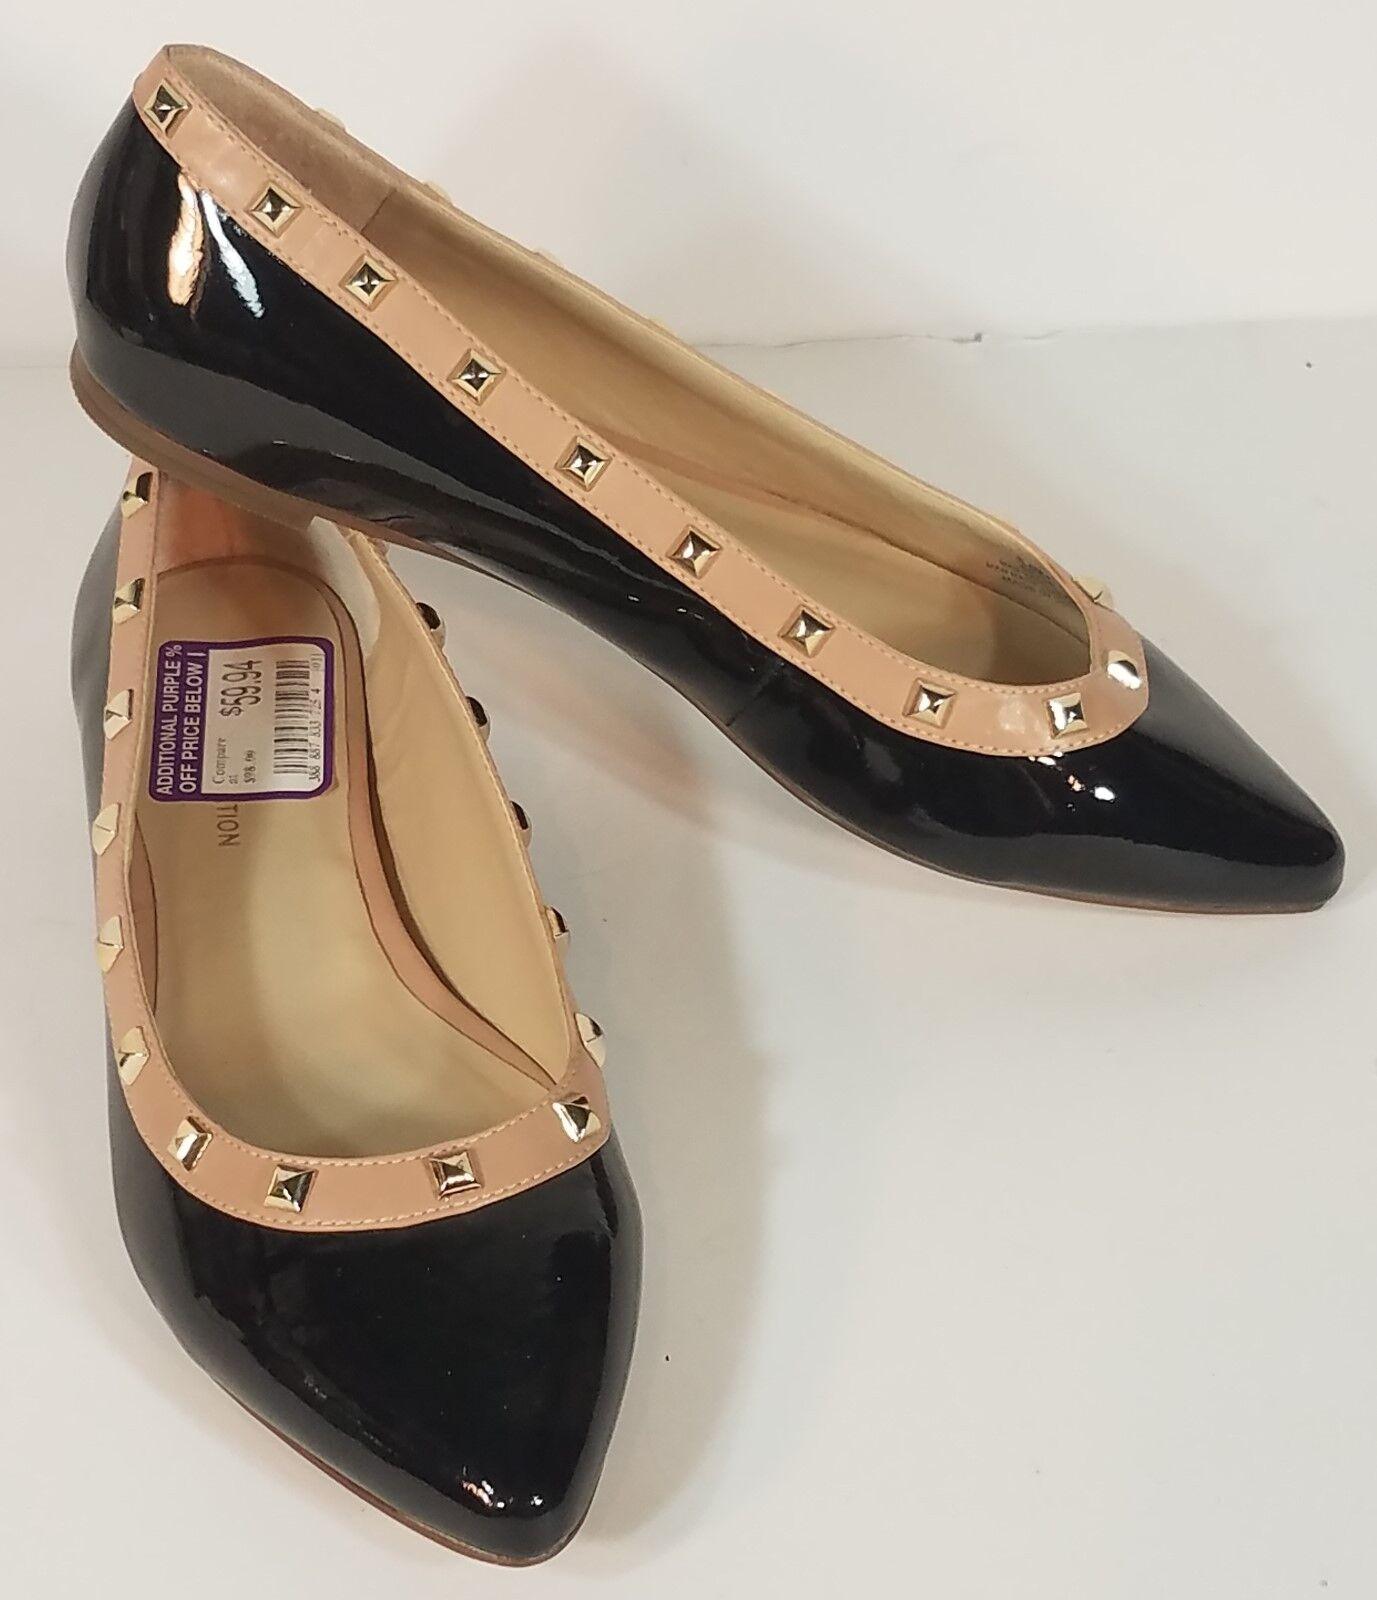 NWT BCBGeneration black patent studded flats slip on dress shoes ladies size 6